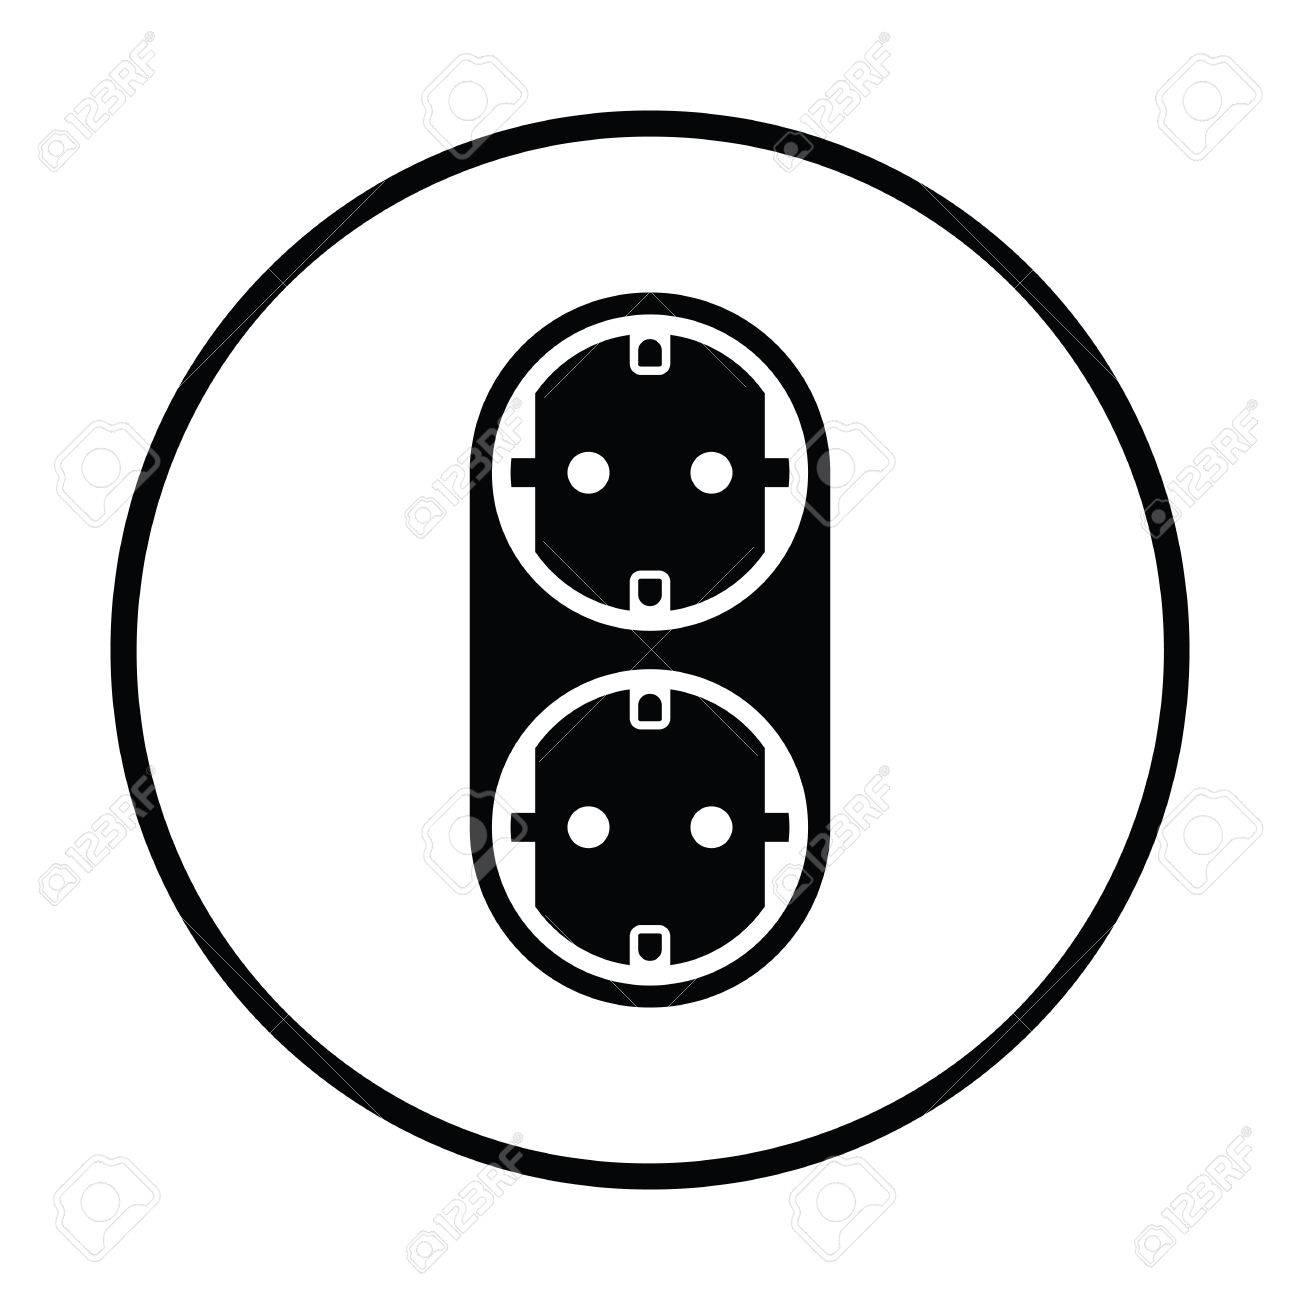 Nice Simbol Gambar Air Conditioner Festooning - Electrical Diagram ...